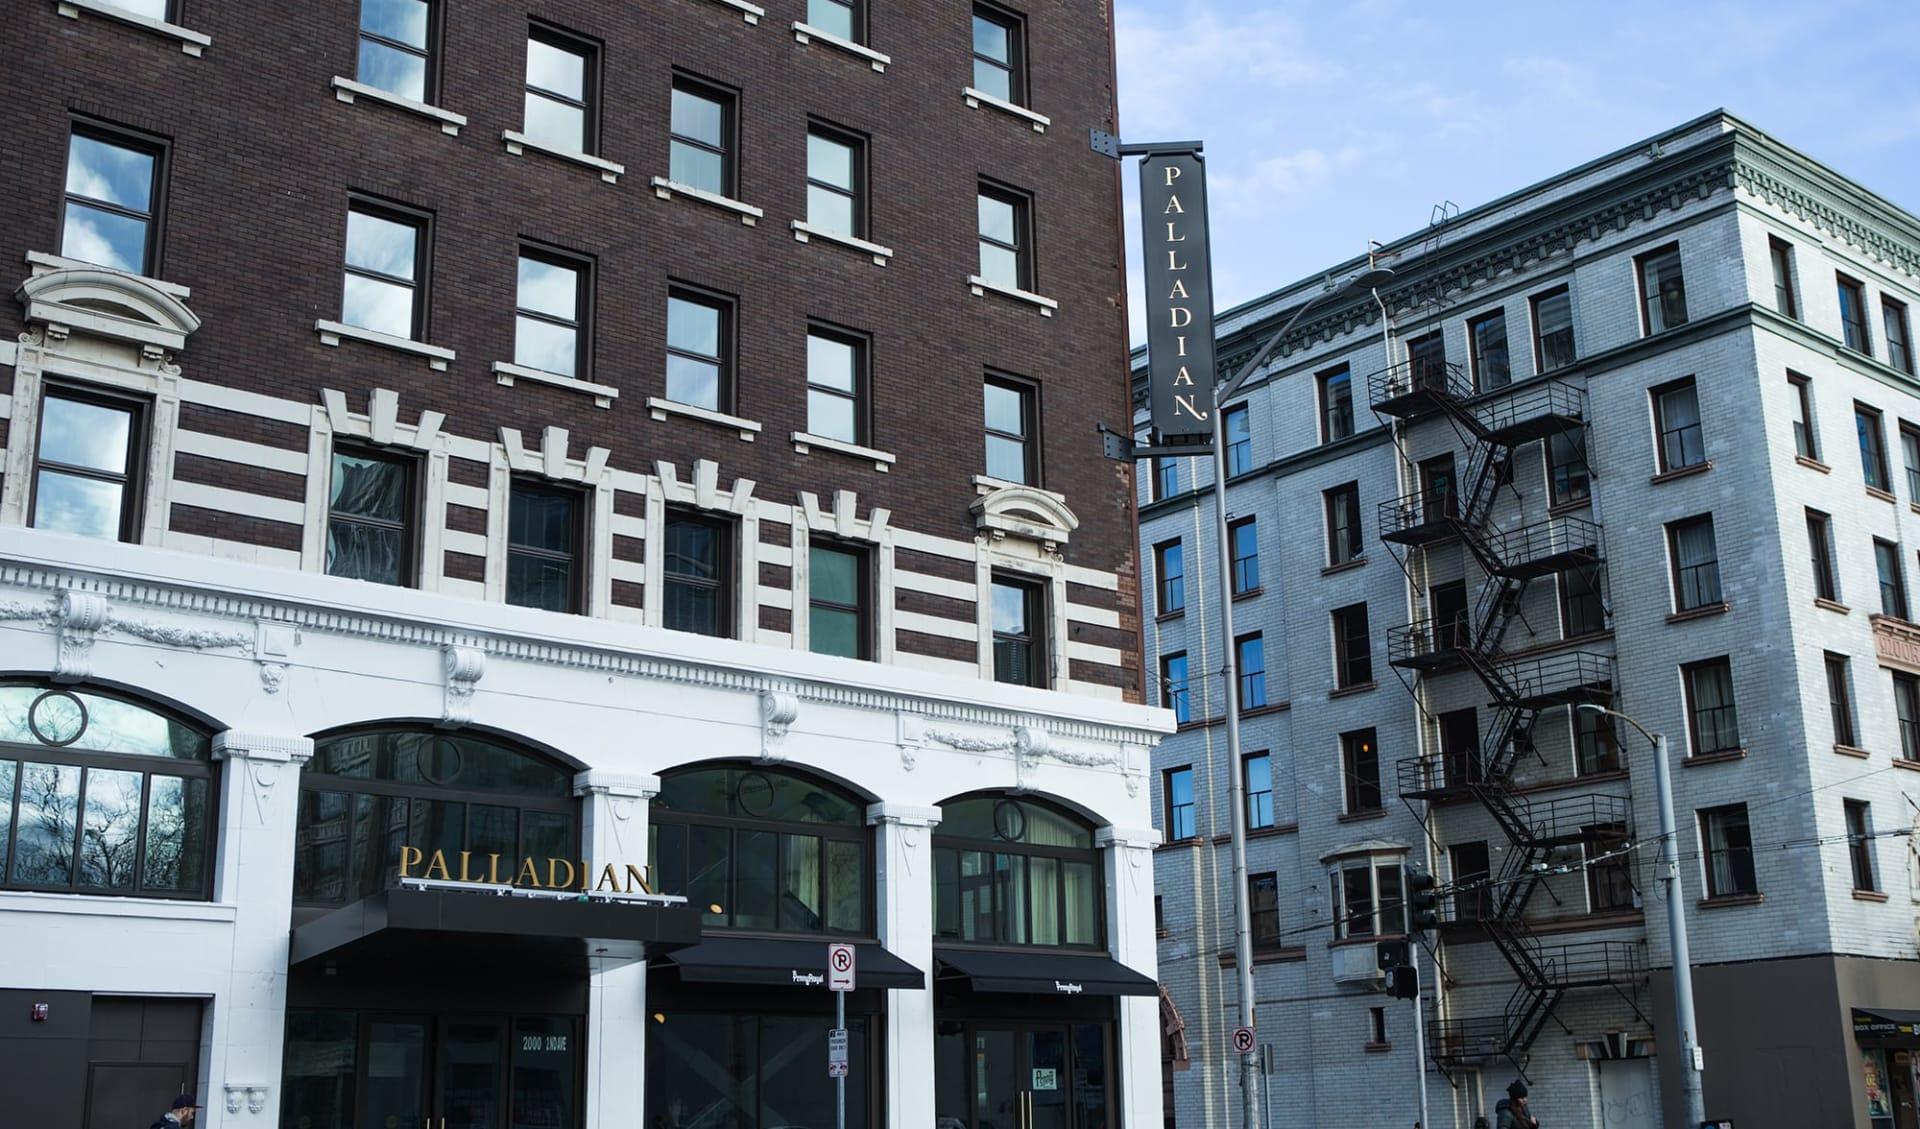 The Palladian Hotel in Seattle: Exterior_Kimpton Palladian Hotel_Hotel_BON